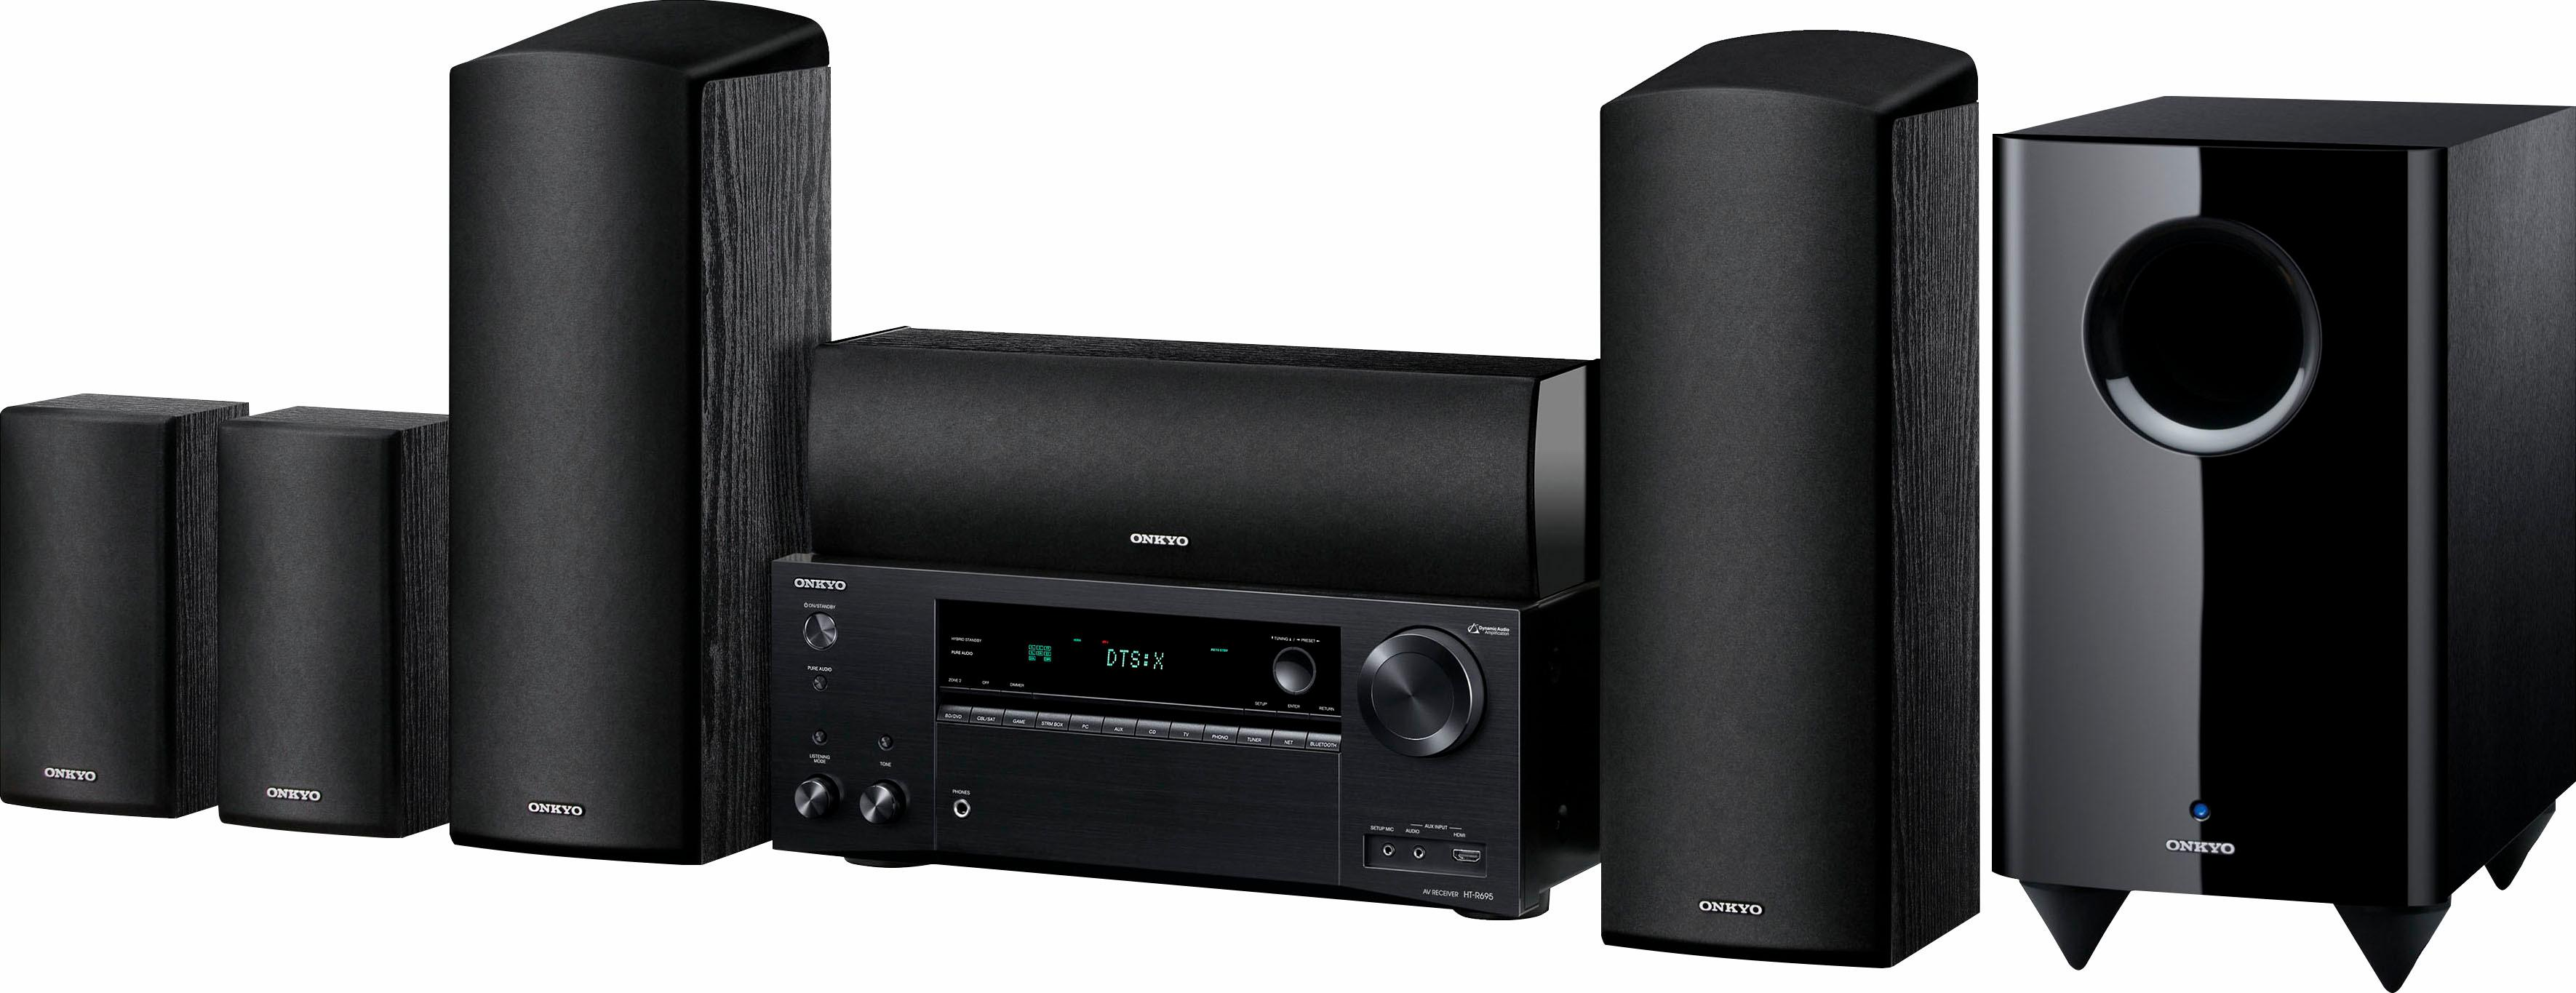 Onkyo »Onkyo HT-S7805-B Heimkinosystem (Hi-Res, Multiroom, Bluetooth, Deezer, Spotify)« Heimkinosystem (Bluetooth, 3D-fähig, Hi-Res Audio)